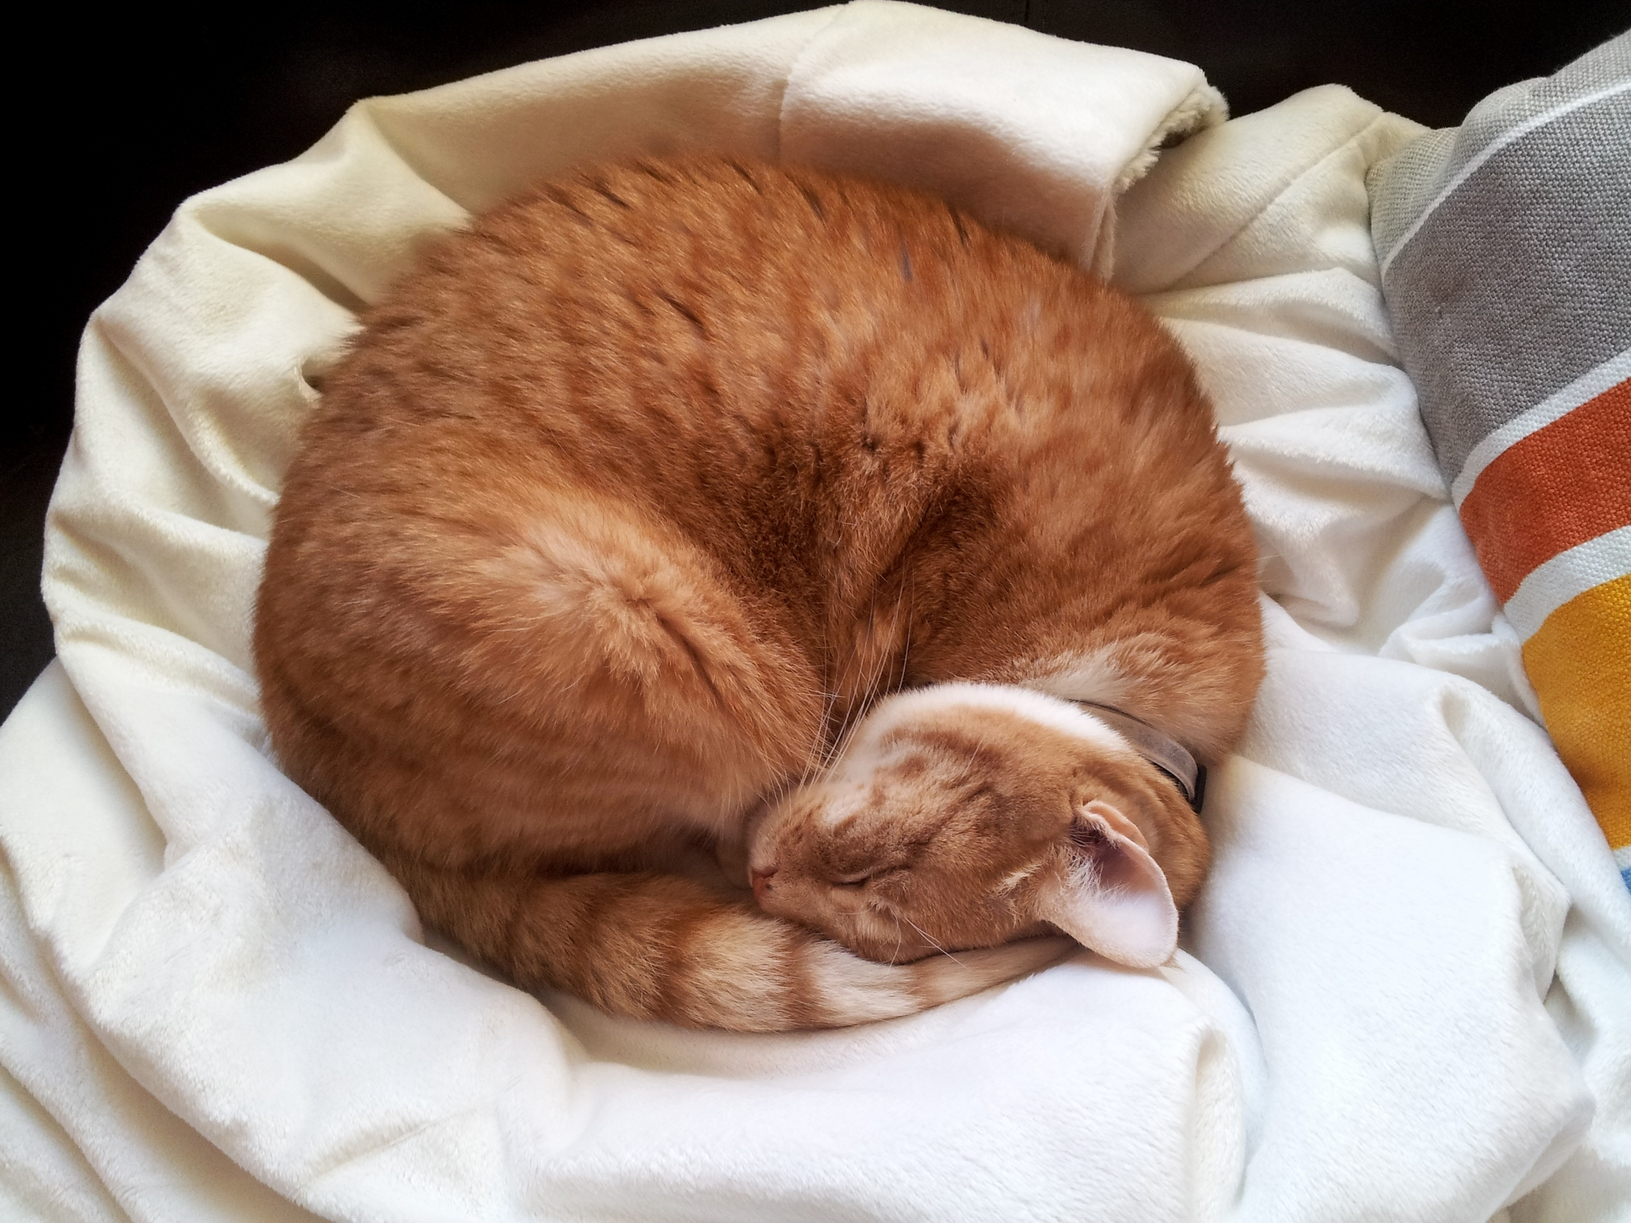 Sleeping in circles.